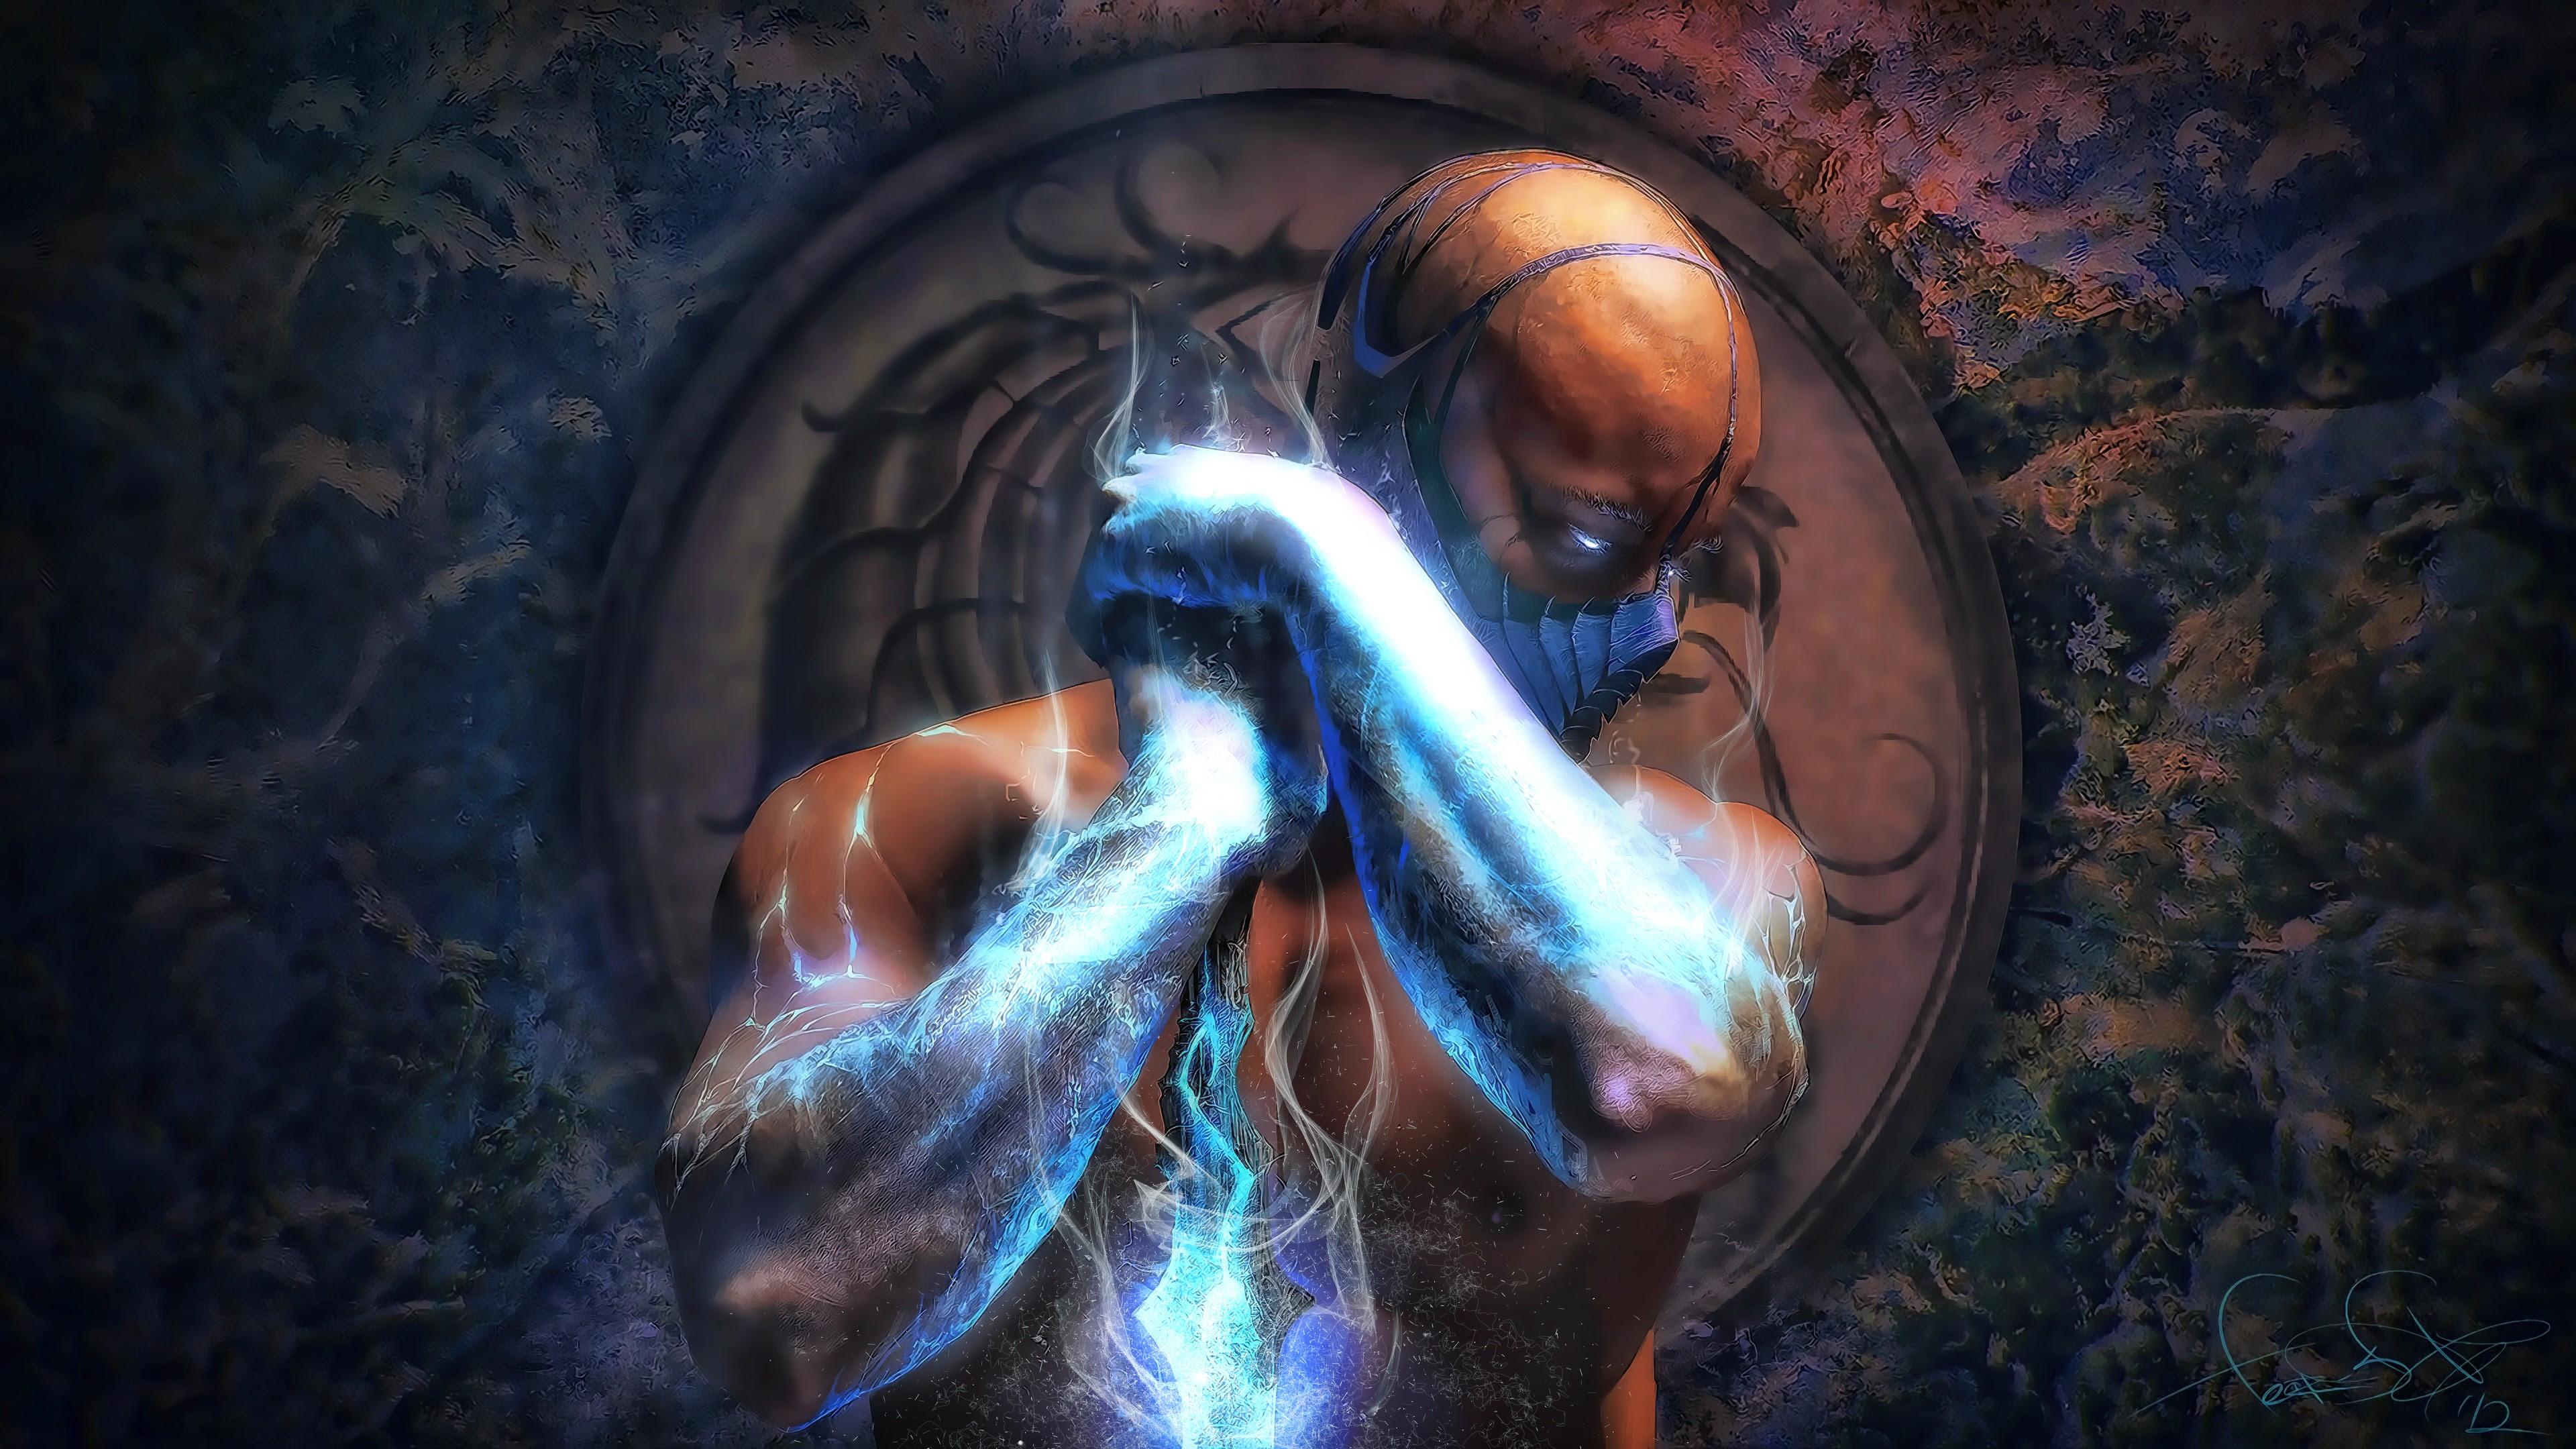 Sub Zero Mortal Kombat X 4k Wallpapers Hd Wallpapers